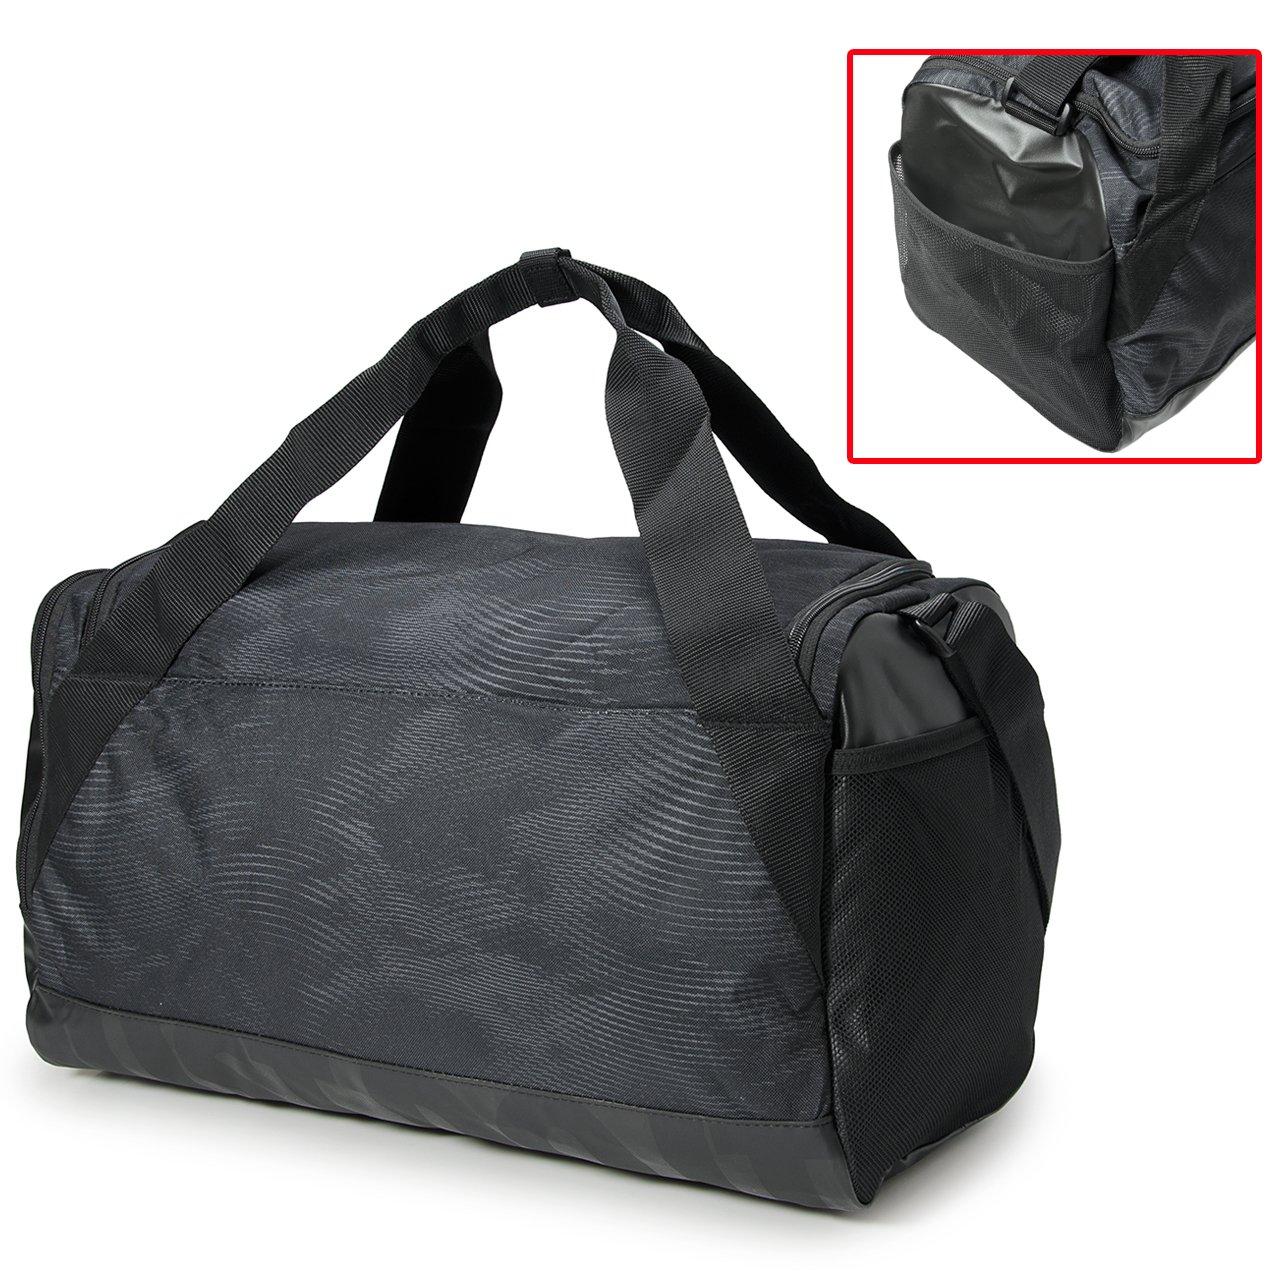 NIKE Brasilia (Small) Graphic Training Duffel Bag  Amazon.ca  Sports    Outdoors a45be6c516cb6